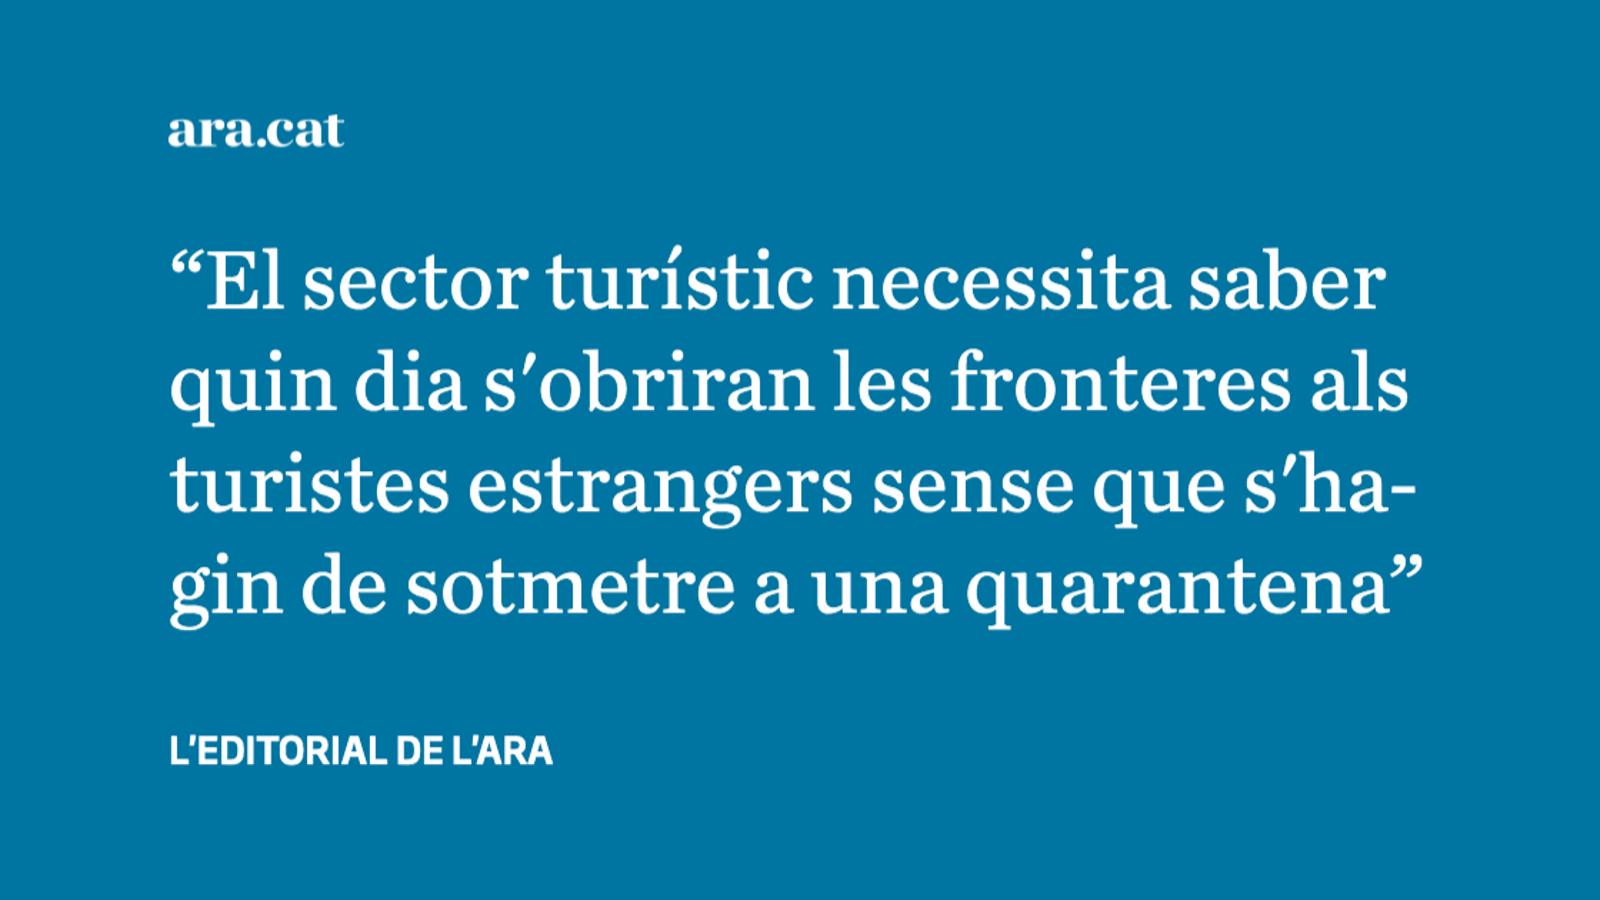 El govern espanyol s'abona a la confusió